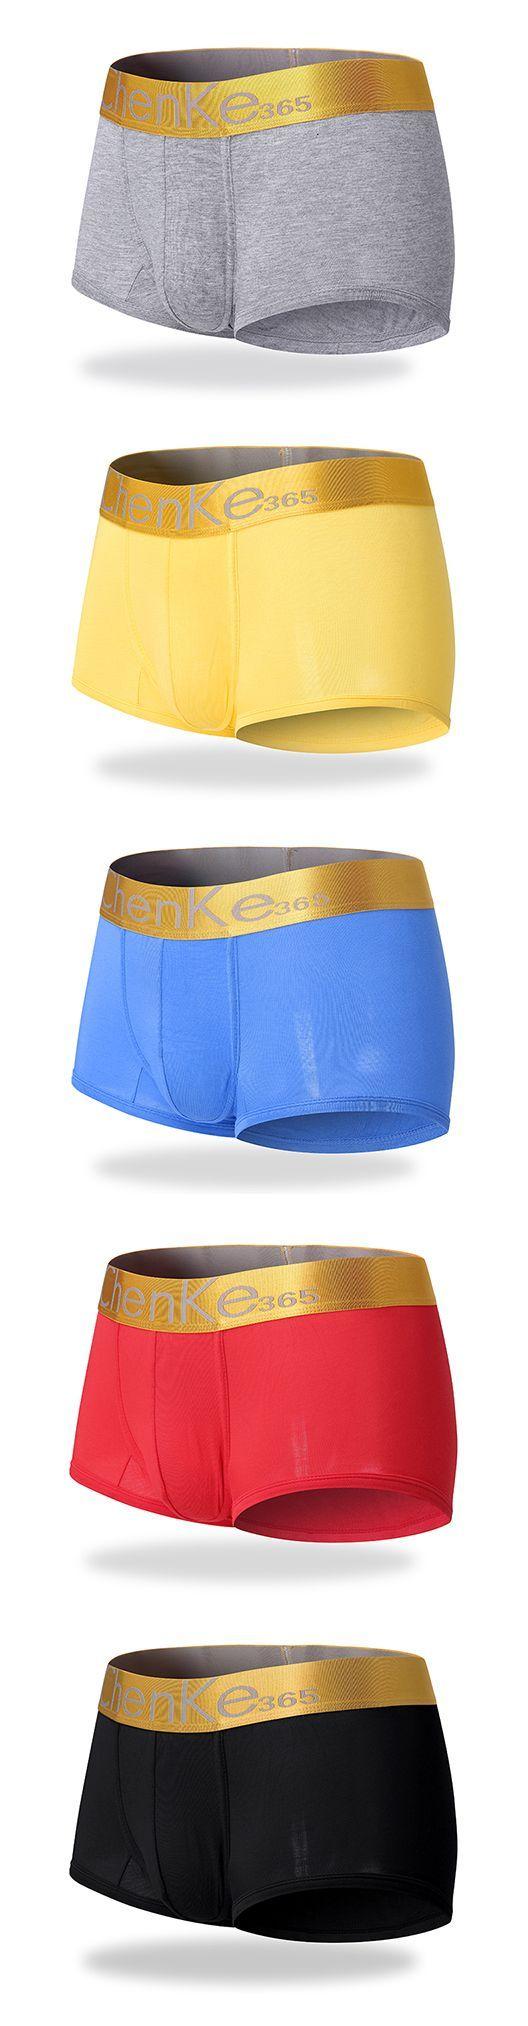 Fashion New Color Waist Mens Modal Triangle U Convex Pockets Anti-low Low Waist Cool Three-legged Underwear Mens Underwear And Digestion Helping Briefs Men's Underwear